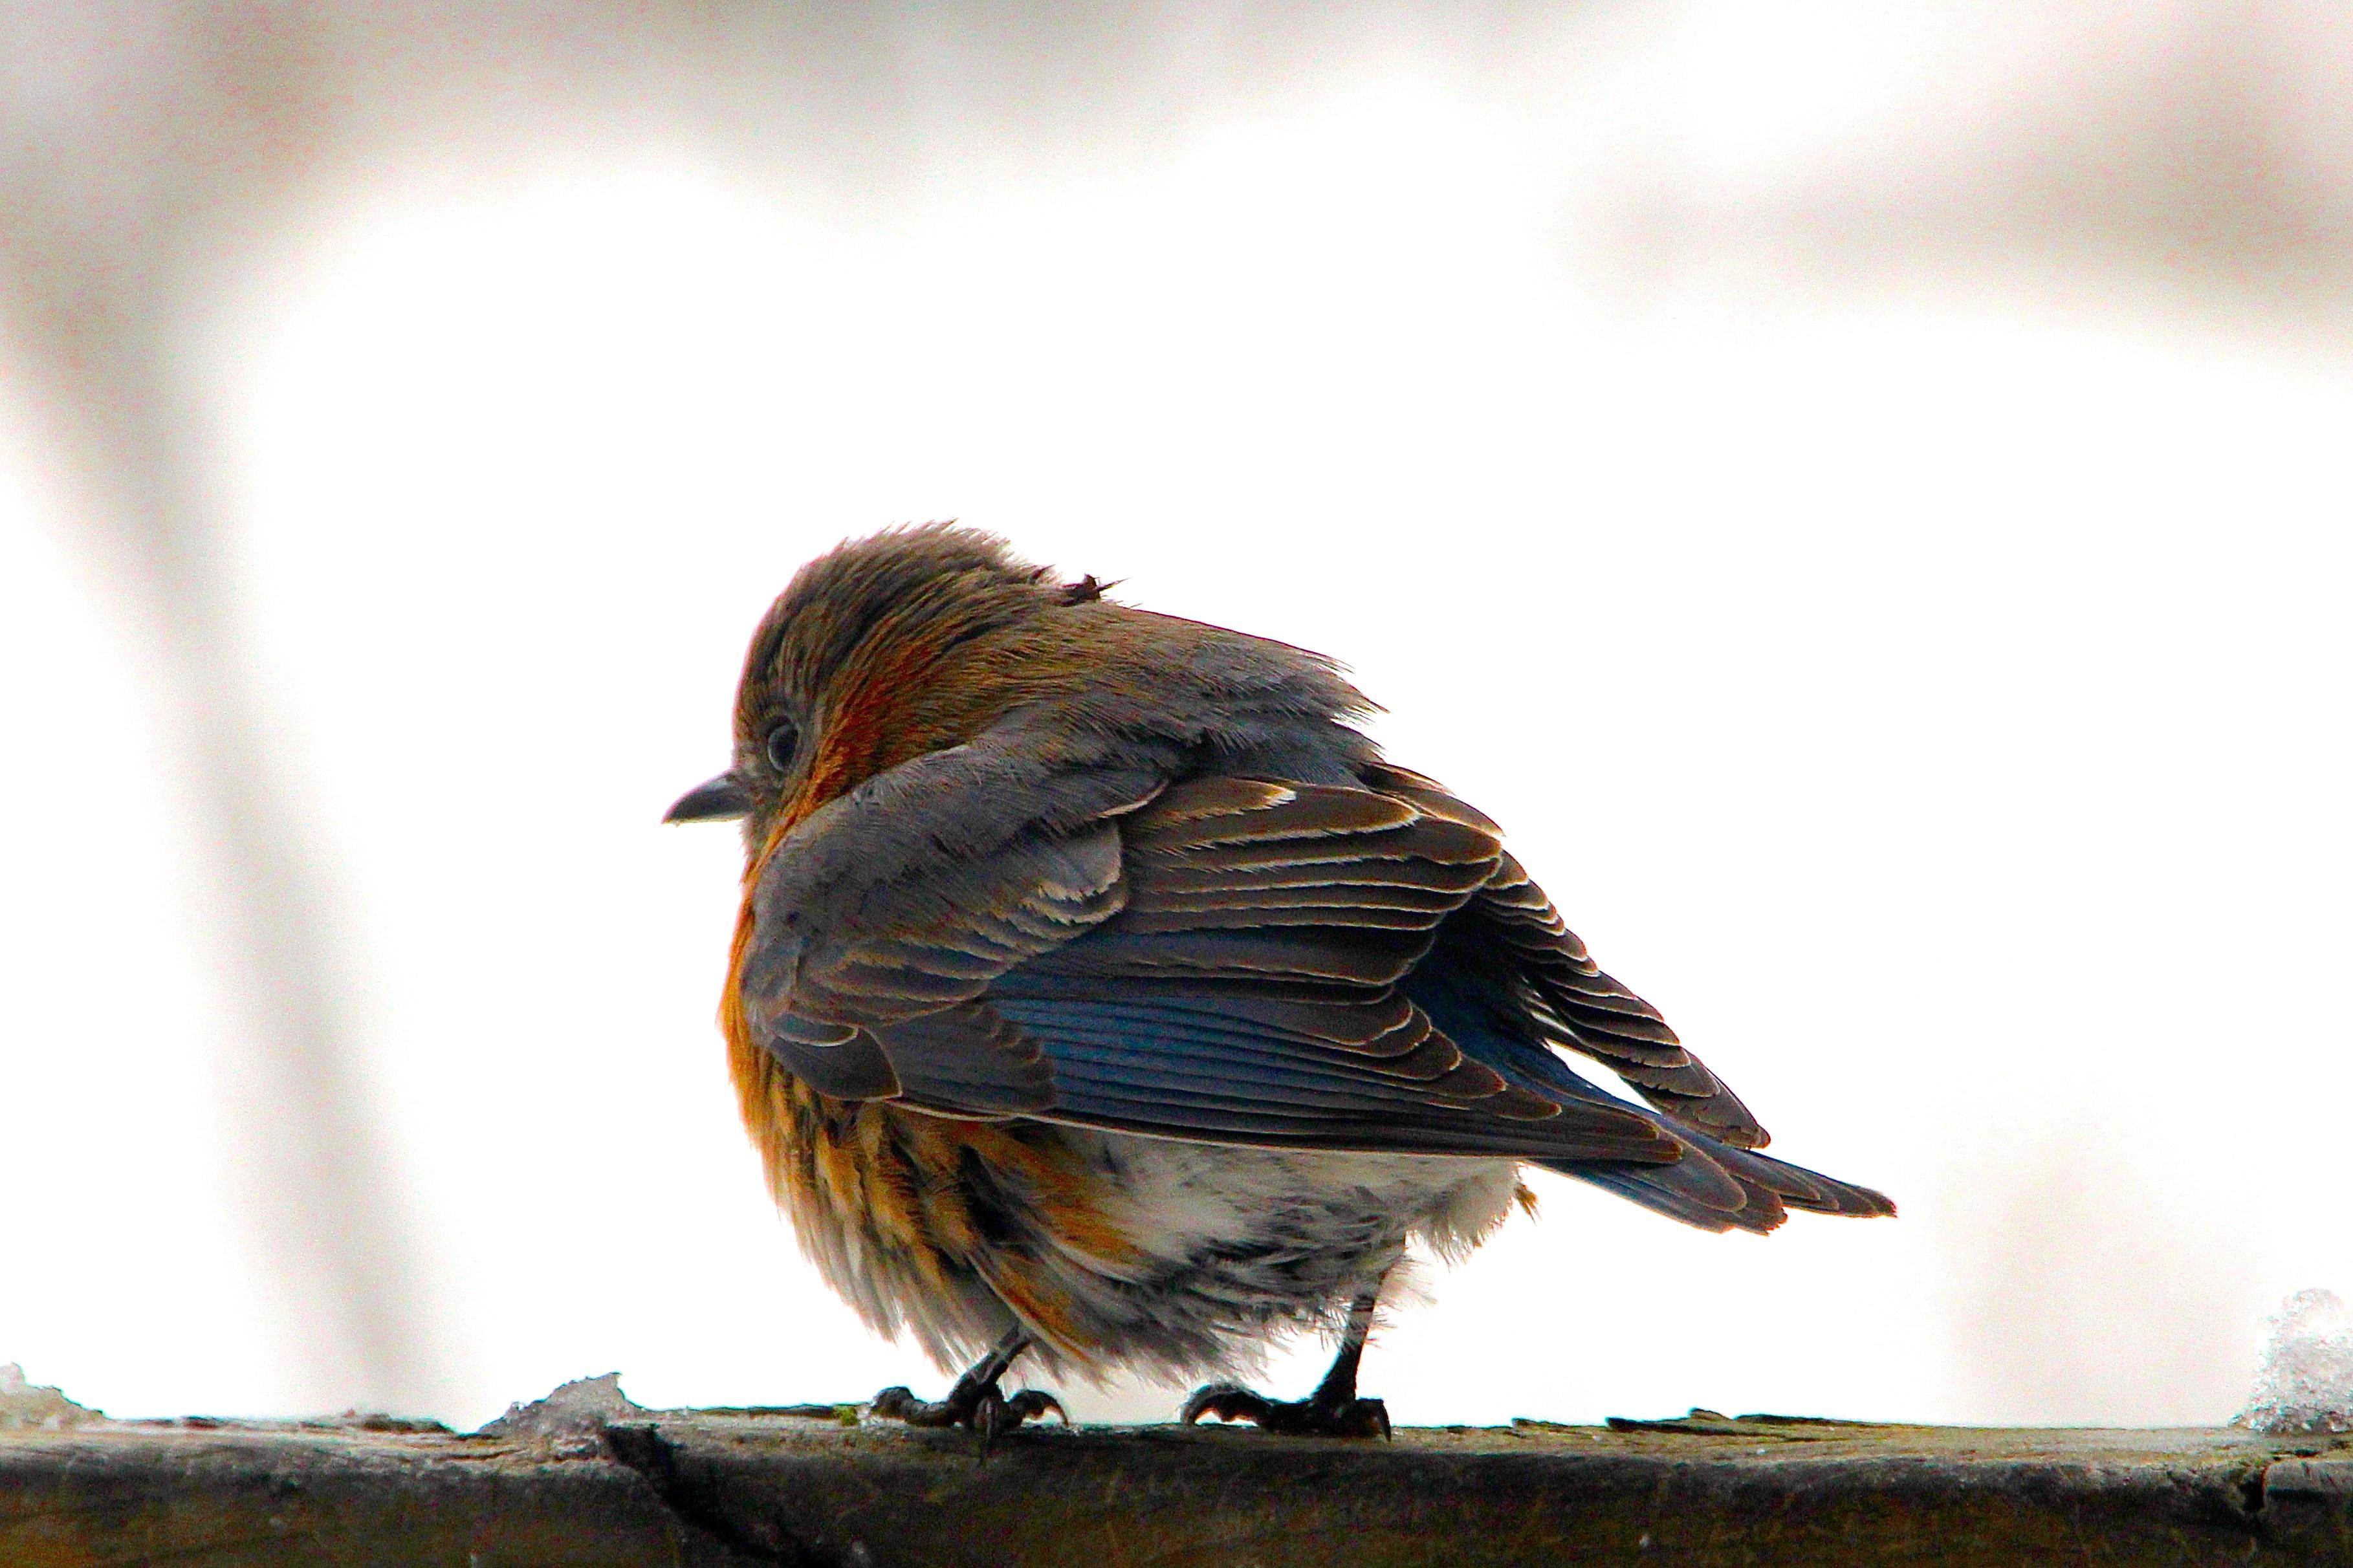 Bluebird fluffed to keep warm. 2